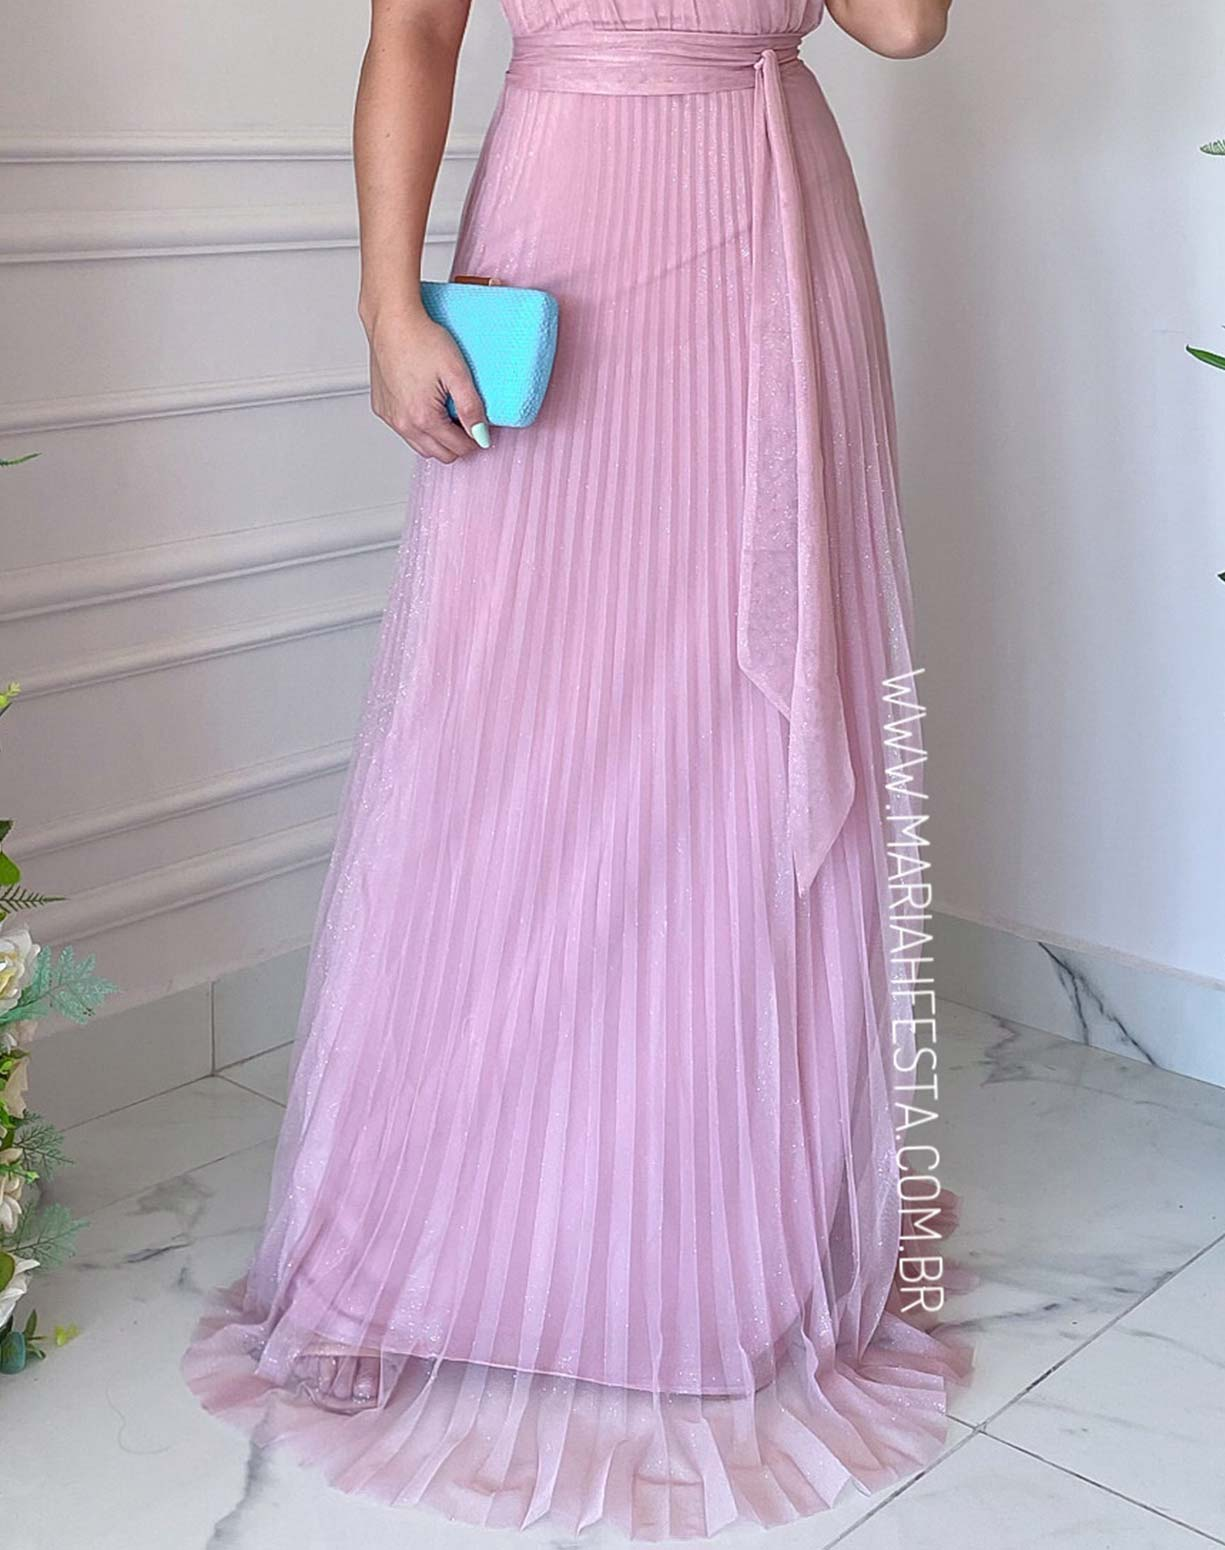 Vestido Rosê Plissado de um Ombro Só